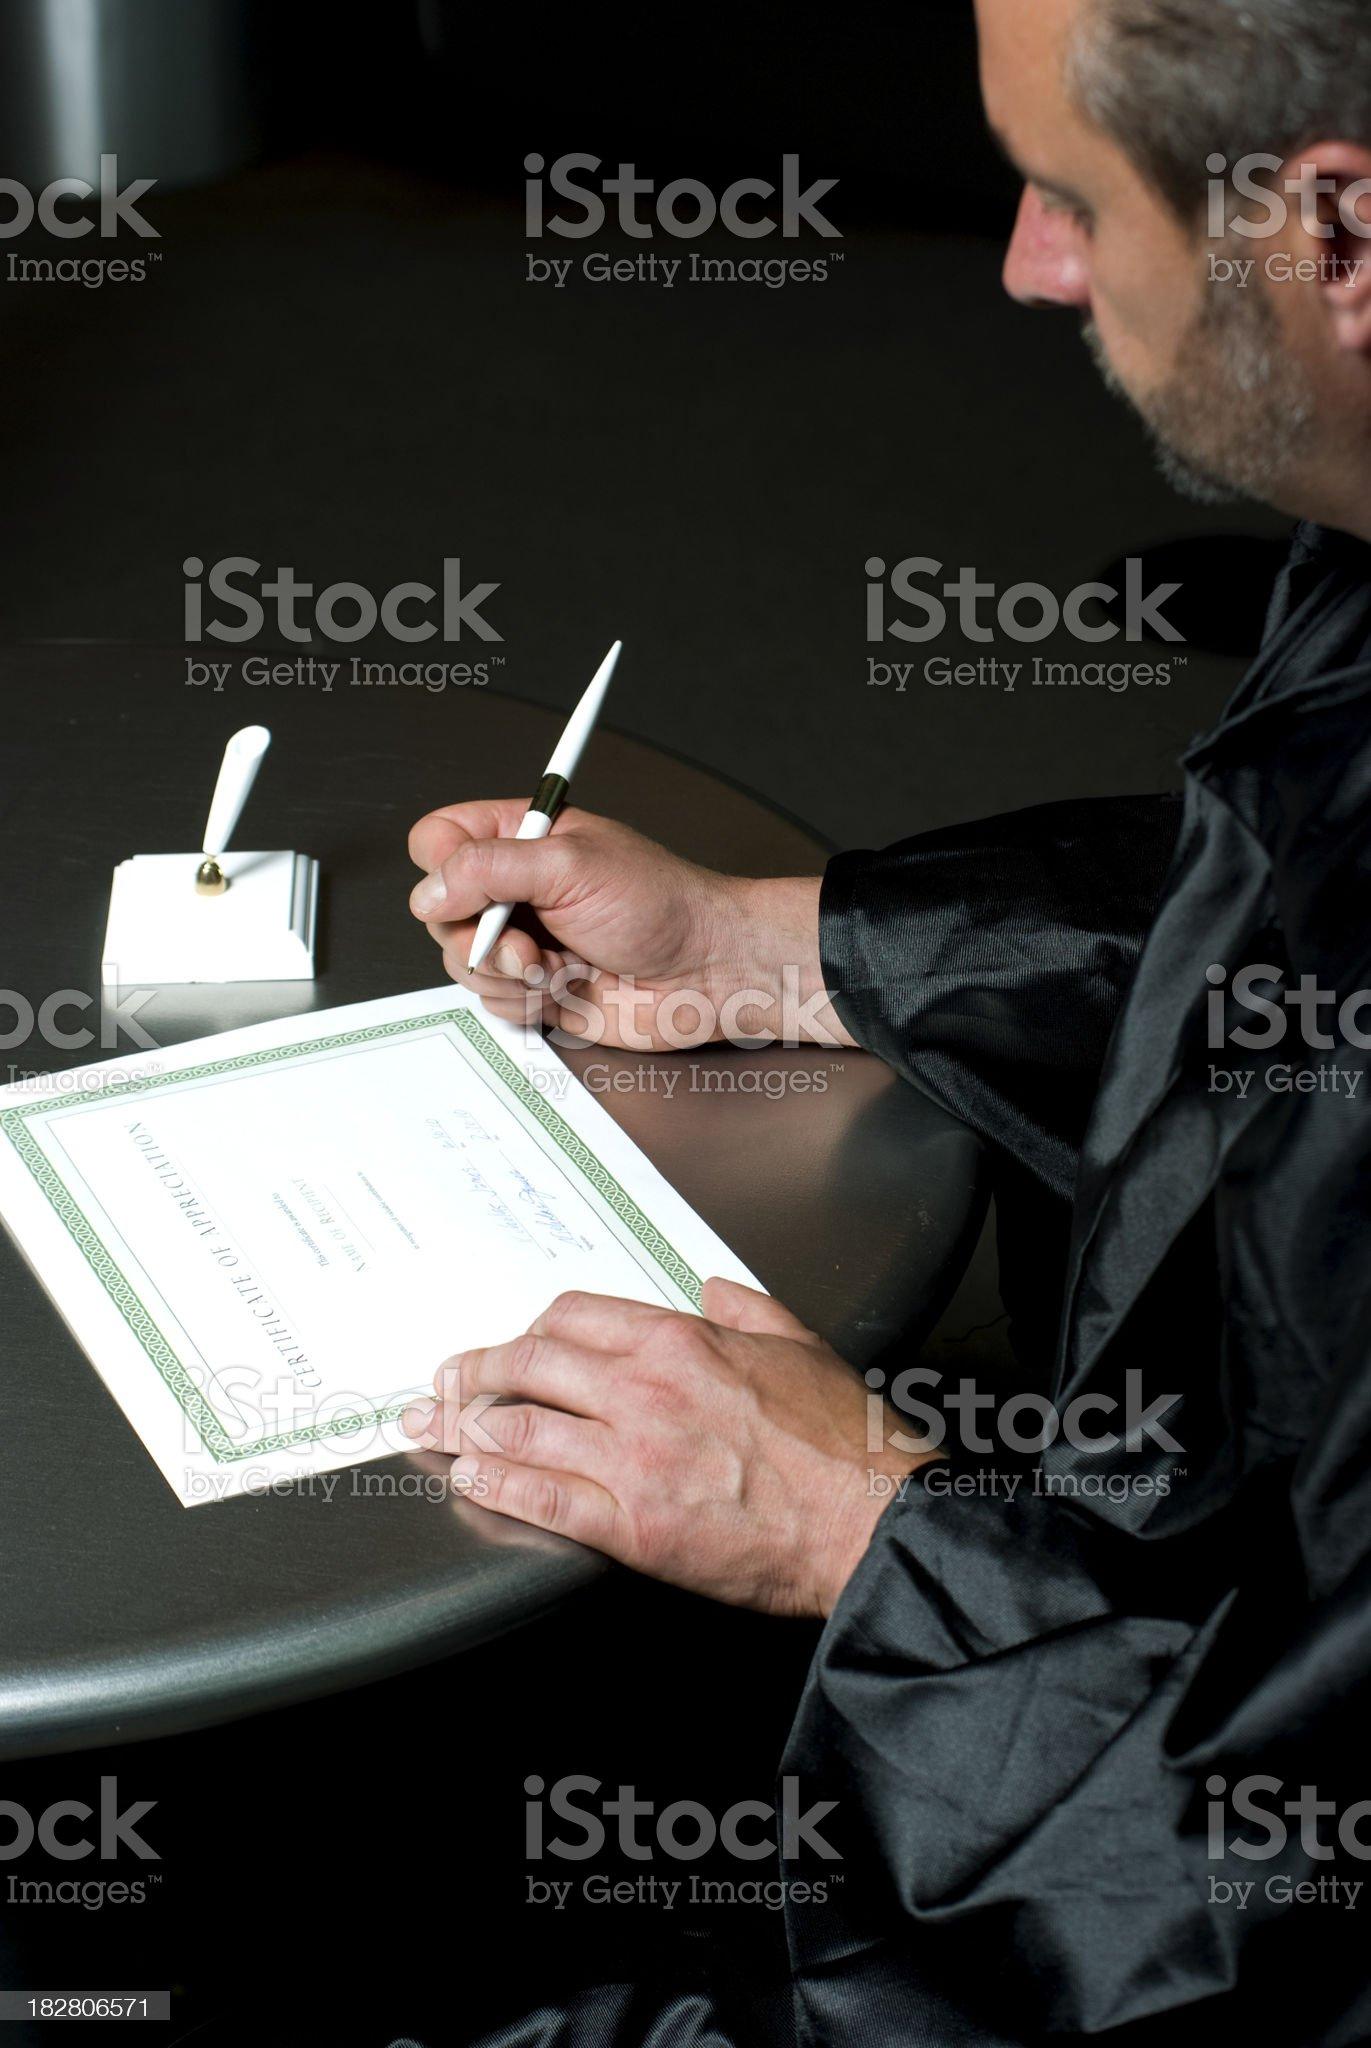 Judge siging document royalty-free stock photo